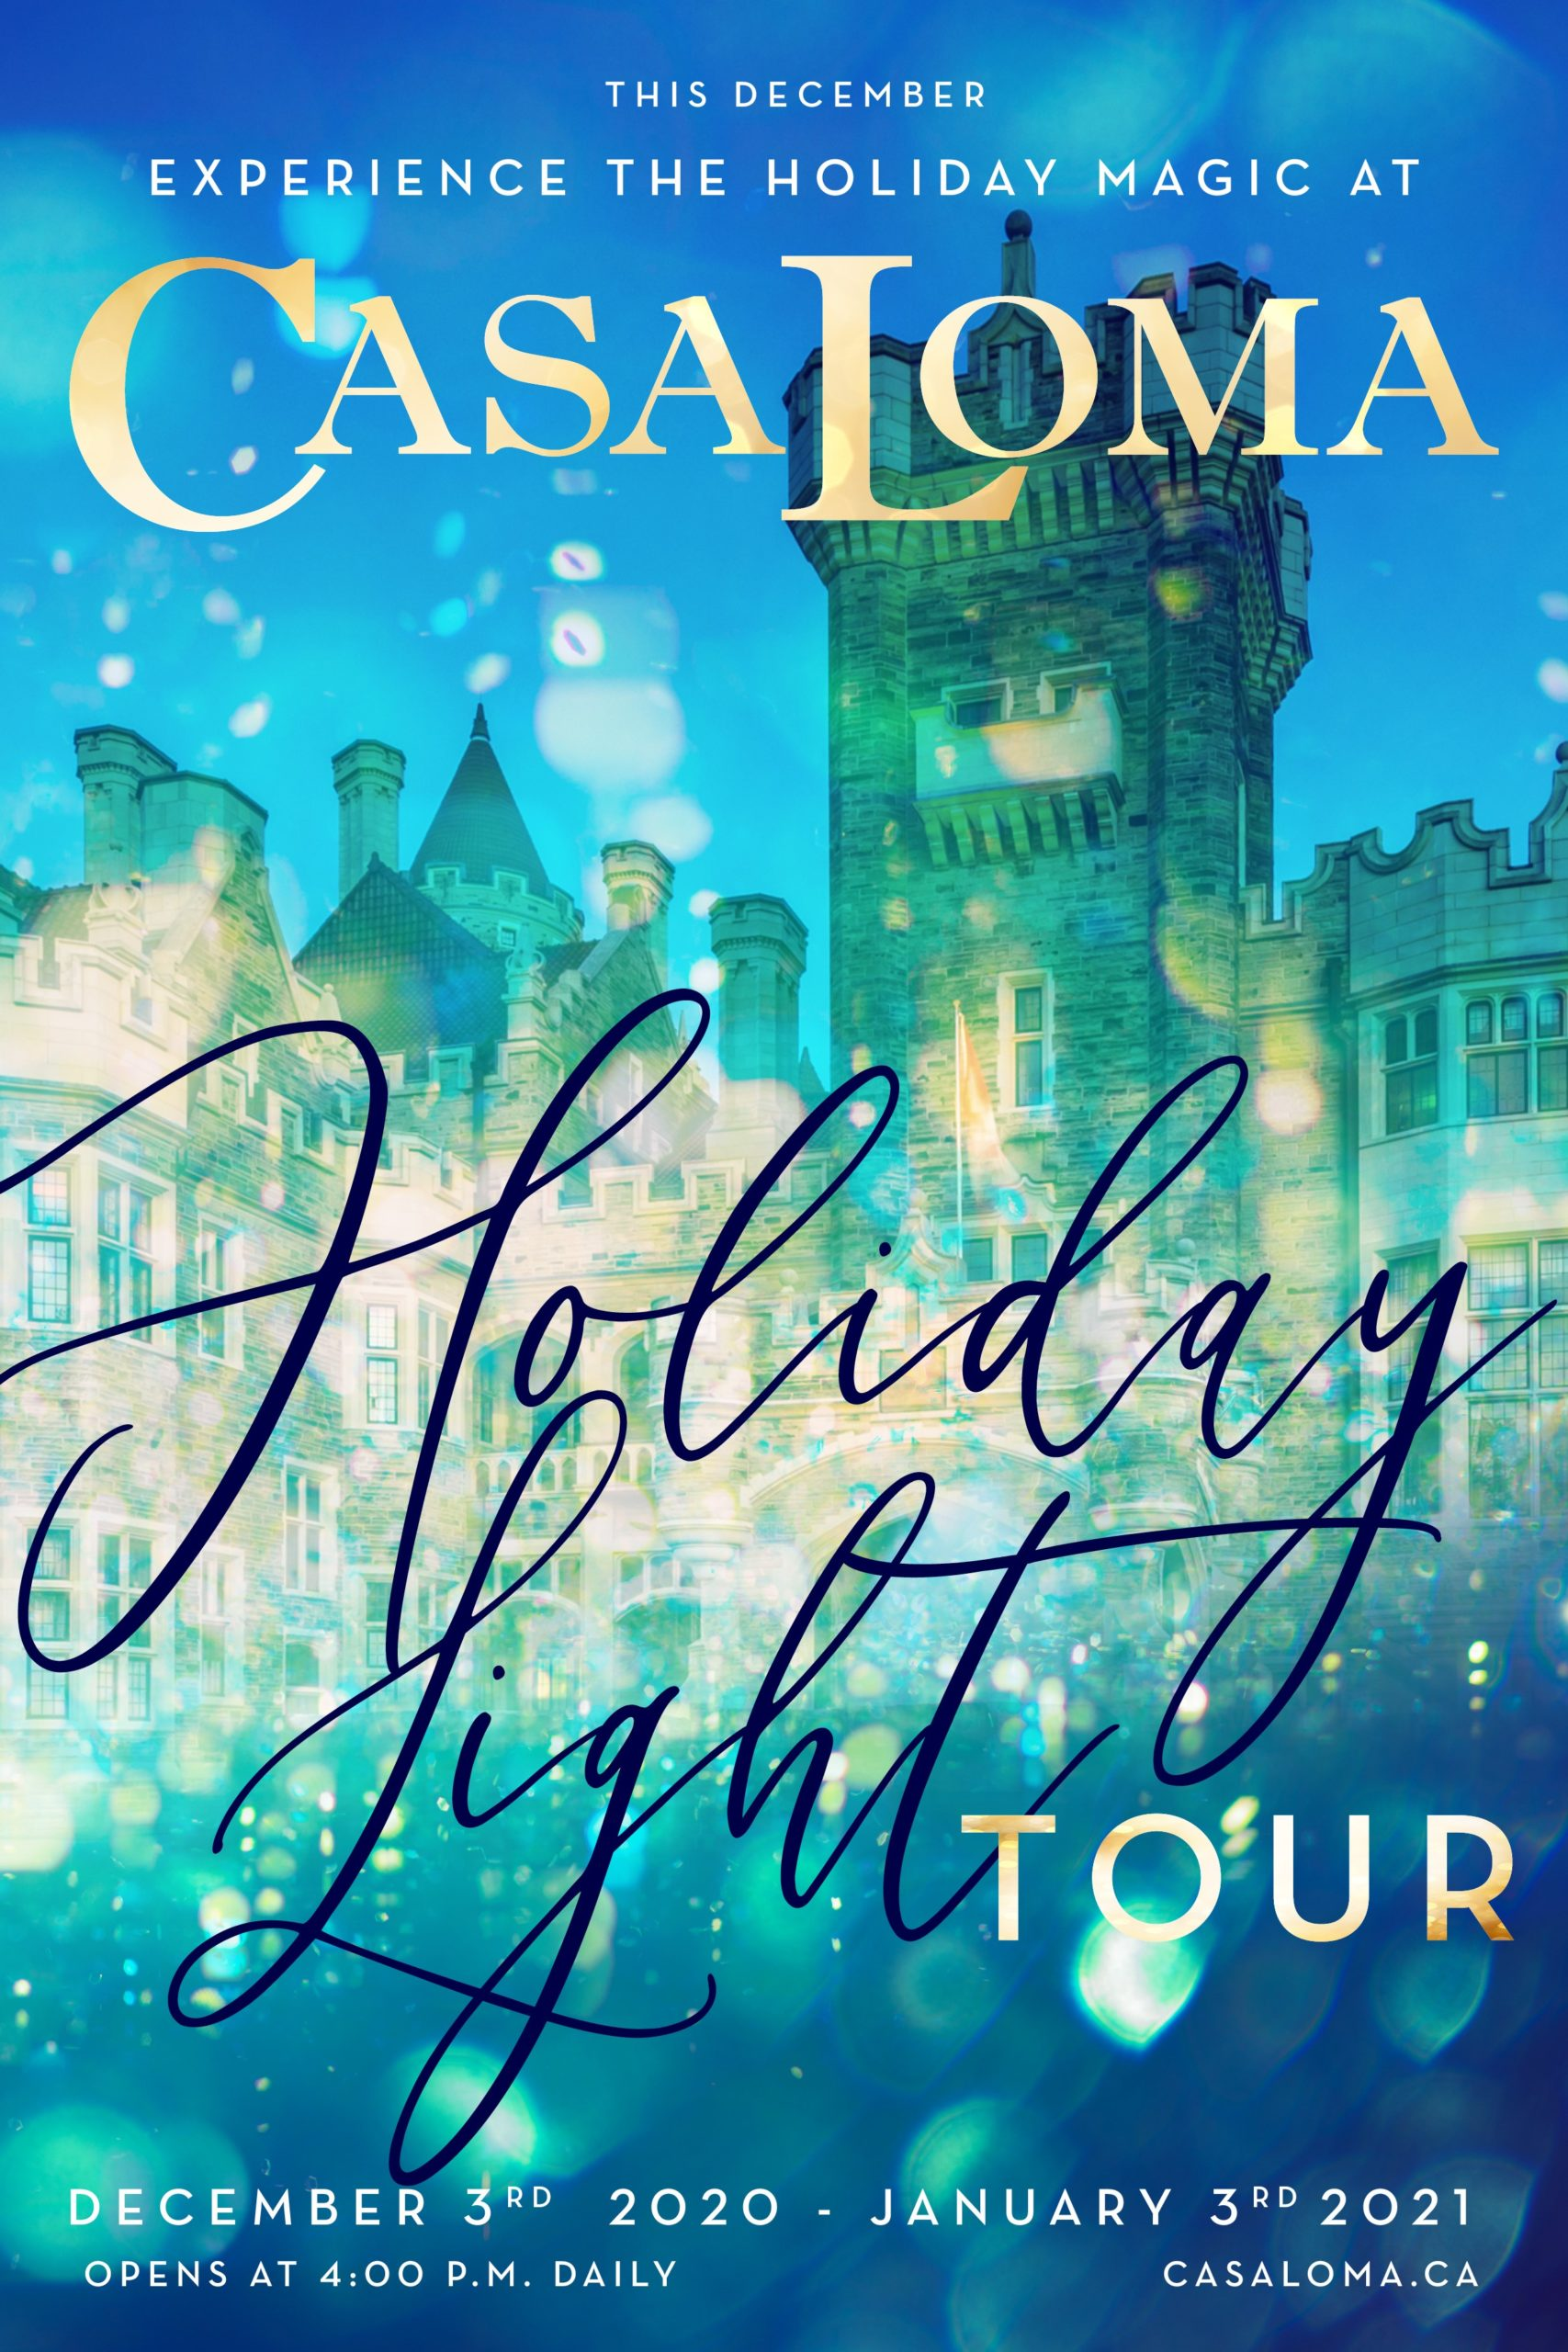 Casa Loma's Holiday Light Tour